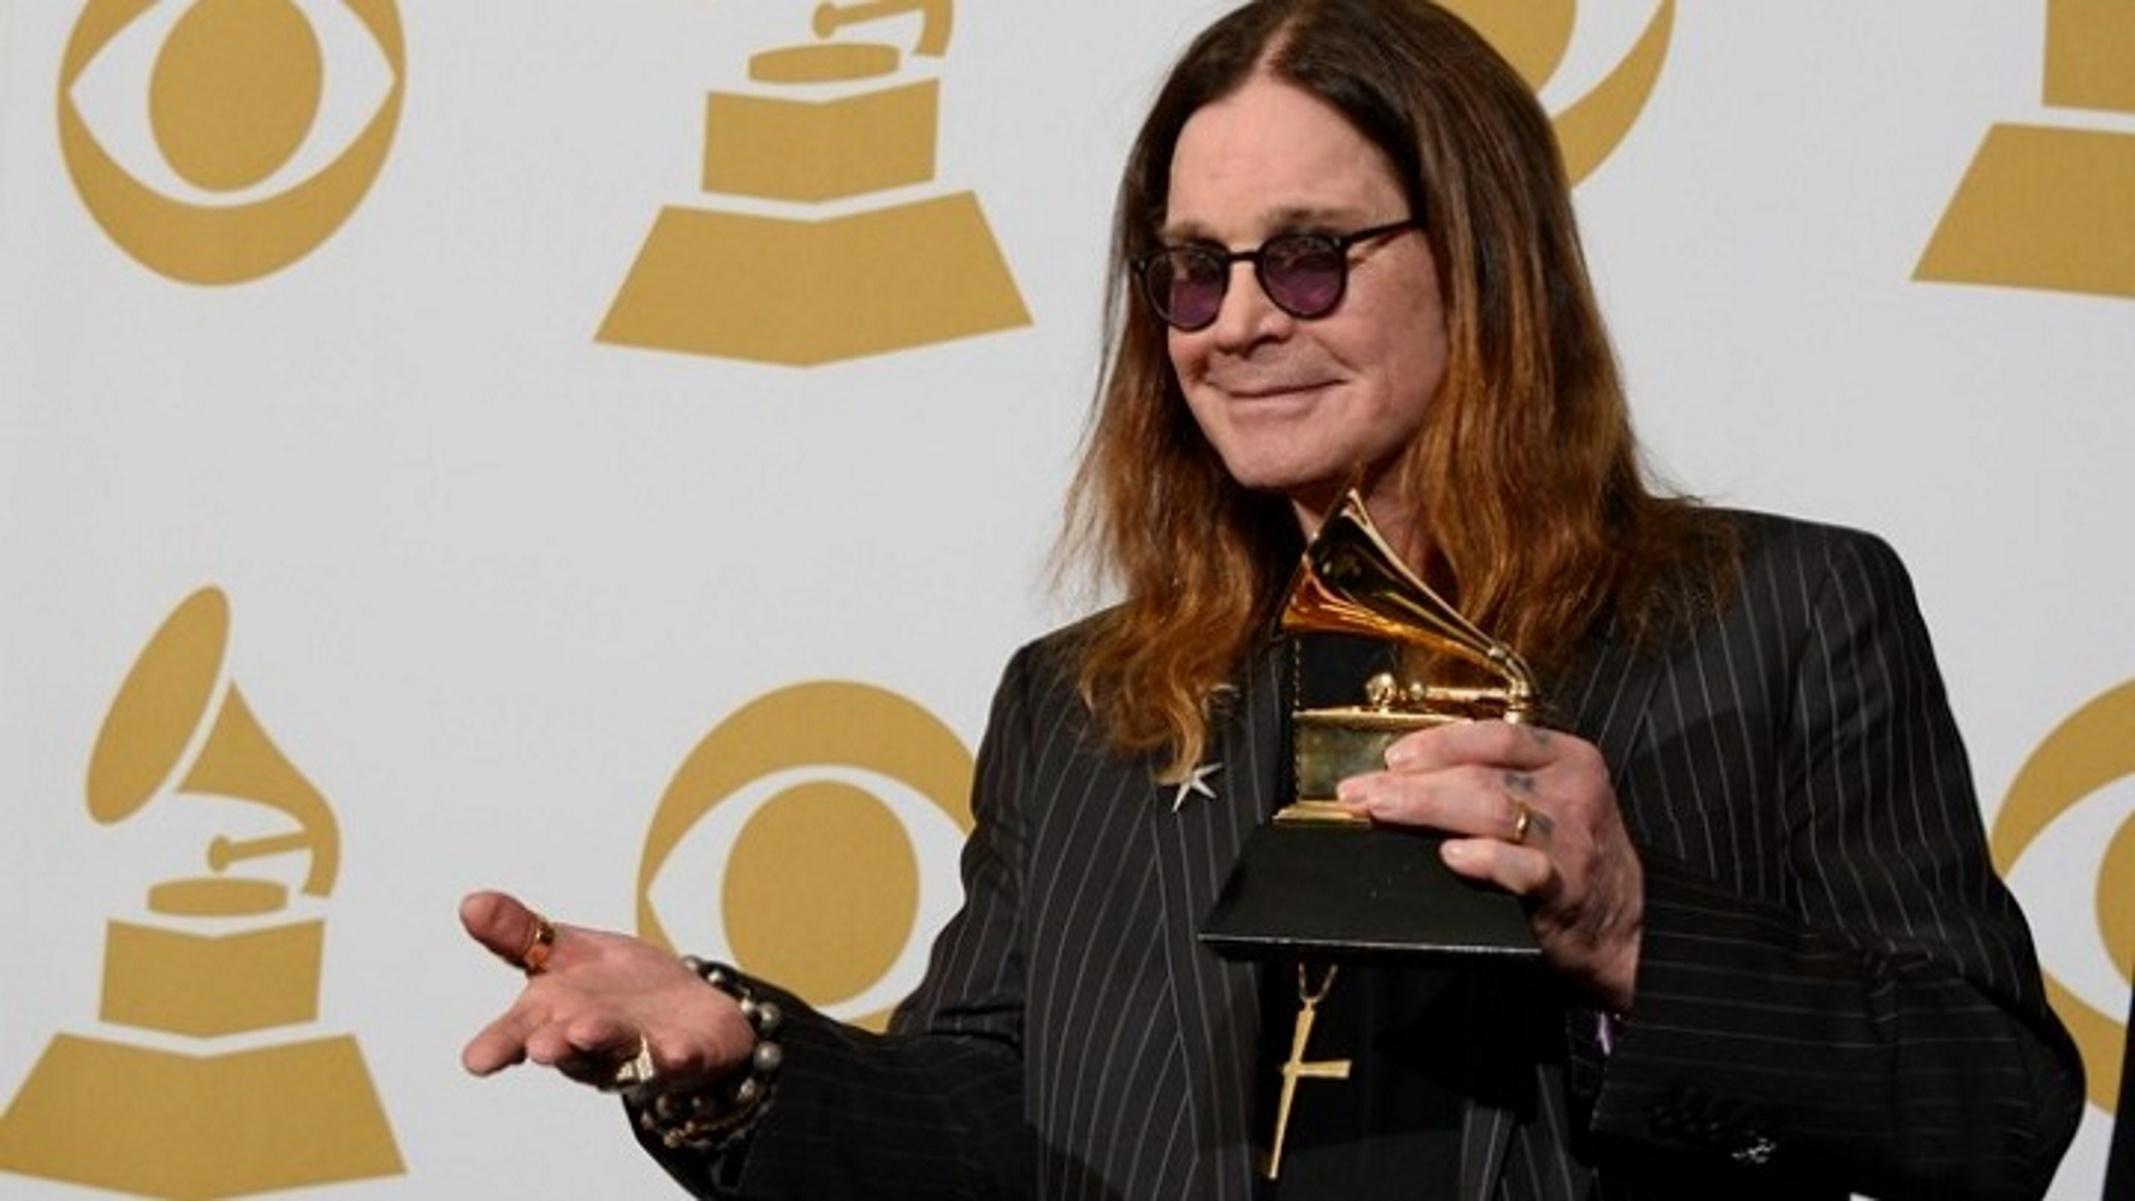 Ozzy Osbourne: Εμβολιάστηκα για κορονοϊό και ένιωσα σαν μαχαιριά (video)